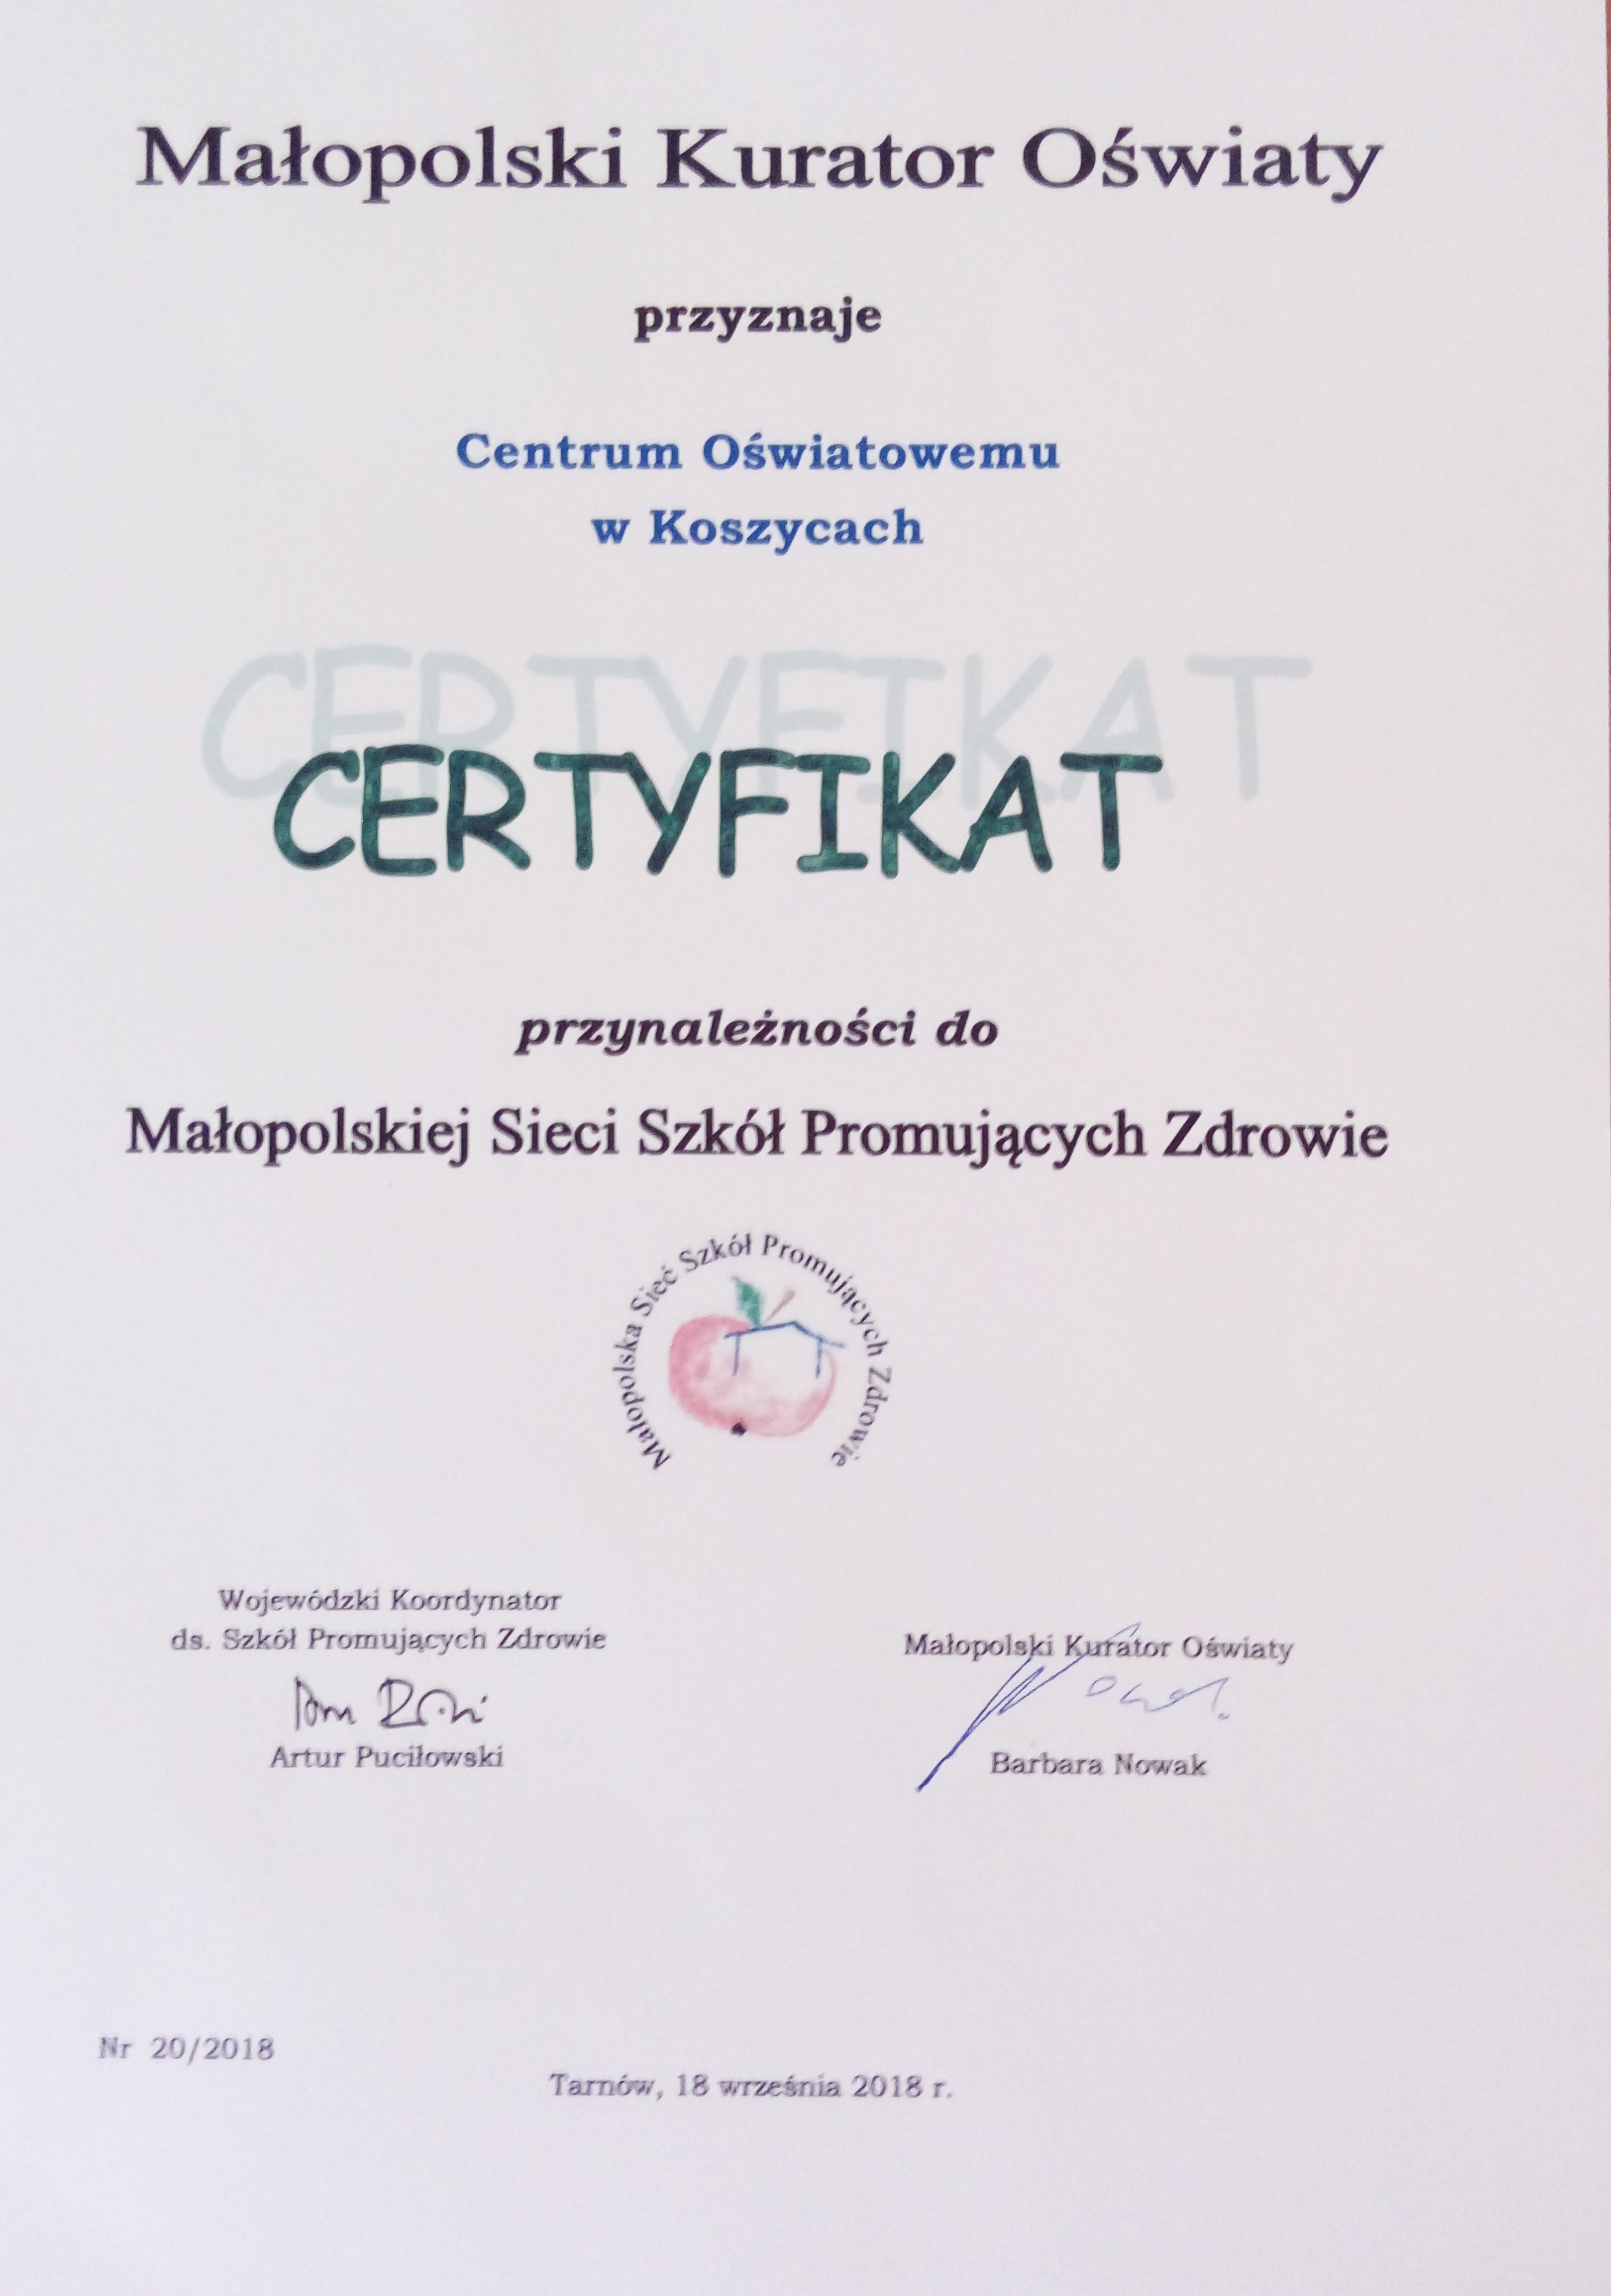 http://koszyce.szkolnastrona.pl/container///certyfikat.jpg